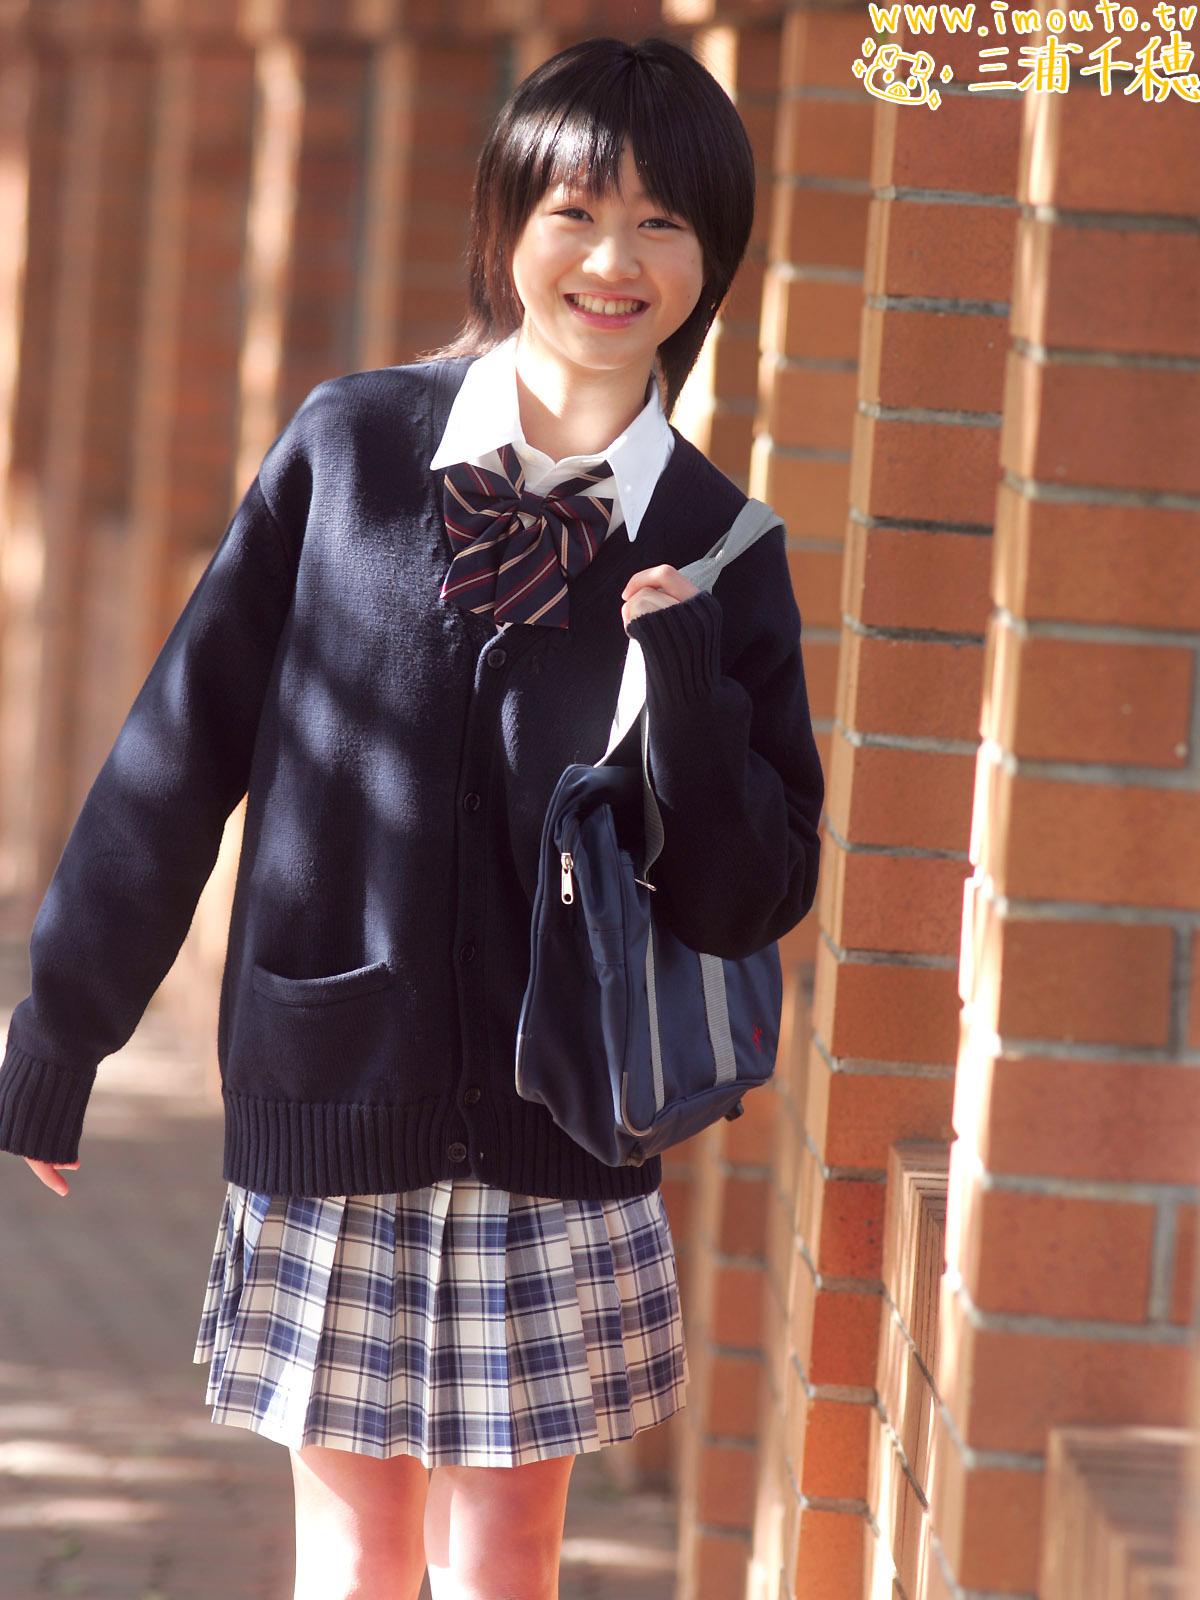 Imouto Tv Photo Gallery Picture Japanese Idol Girls U15 Dvd